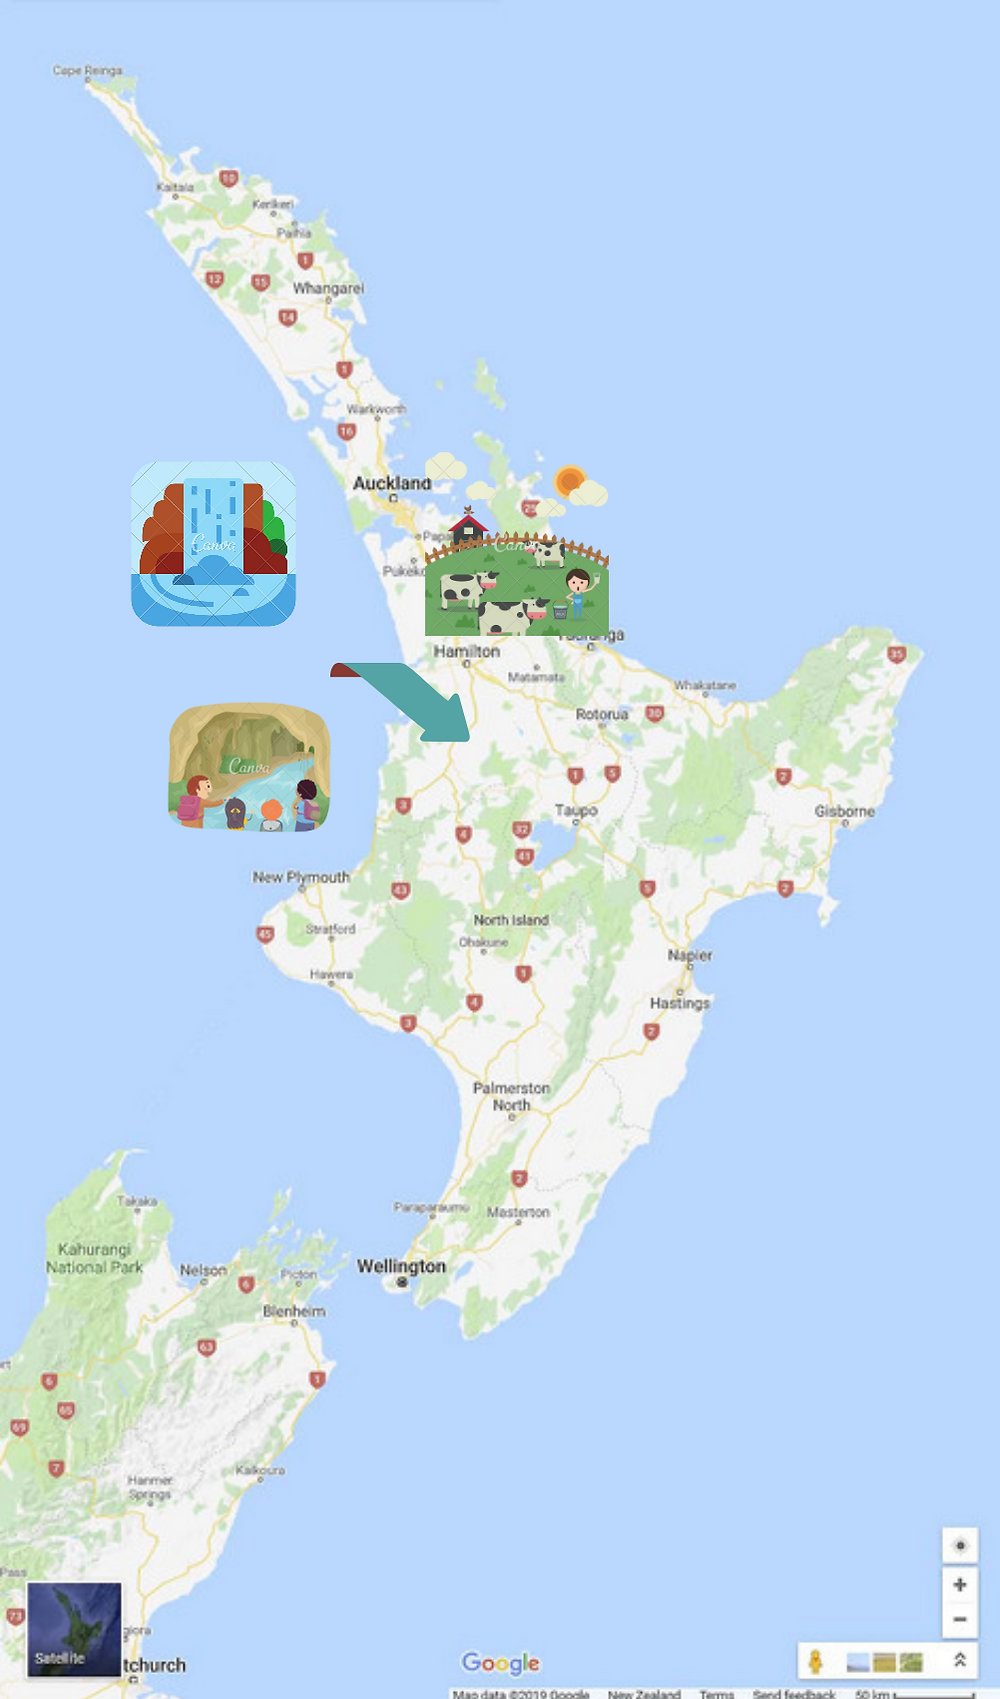 Touring map of Waitomo Region - Waitomo Caves